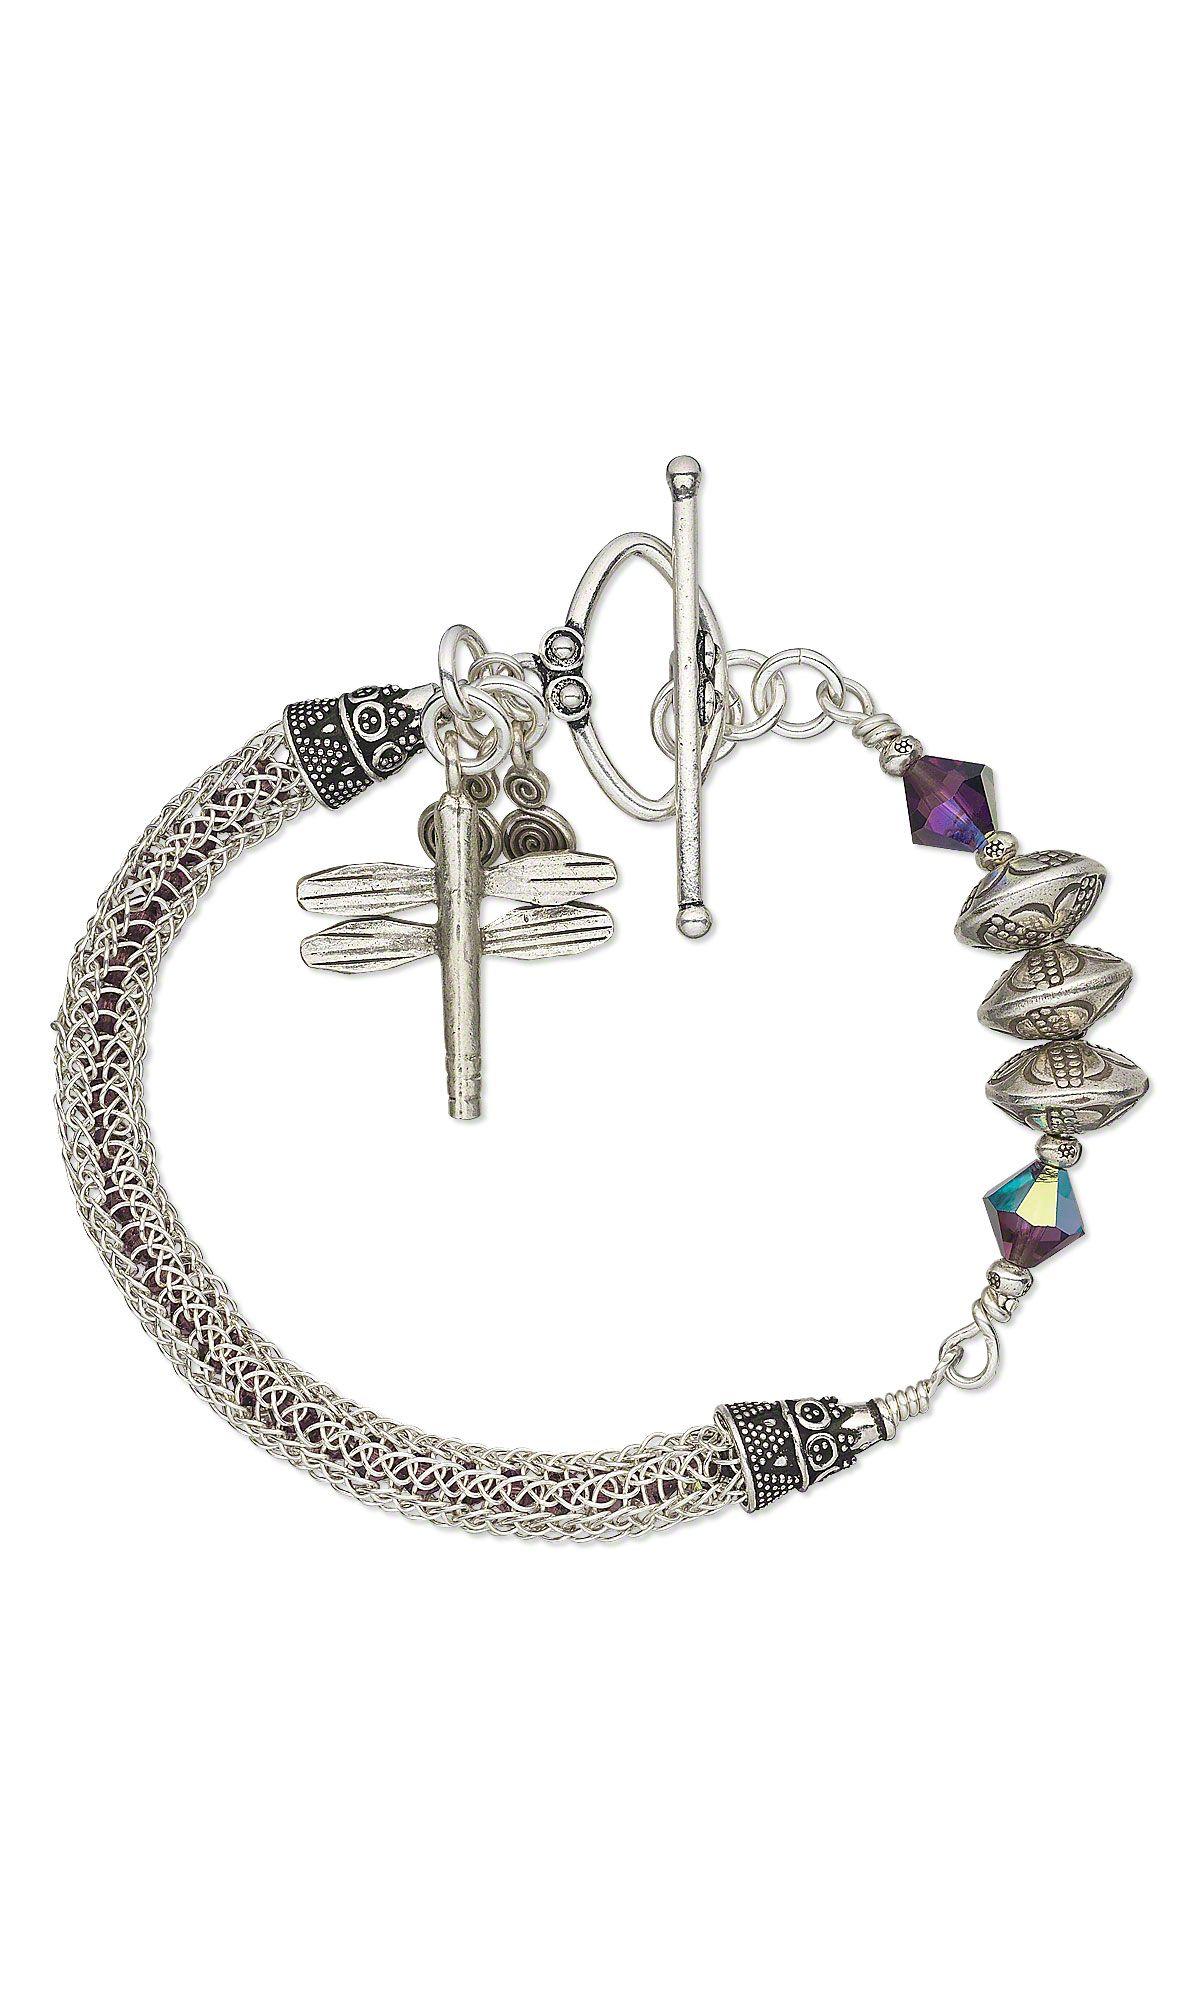 Viking Knit Bracelet | diy jewelry | Pinterest | Drahtschmuck ...